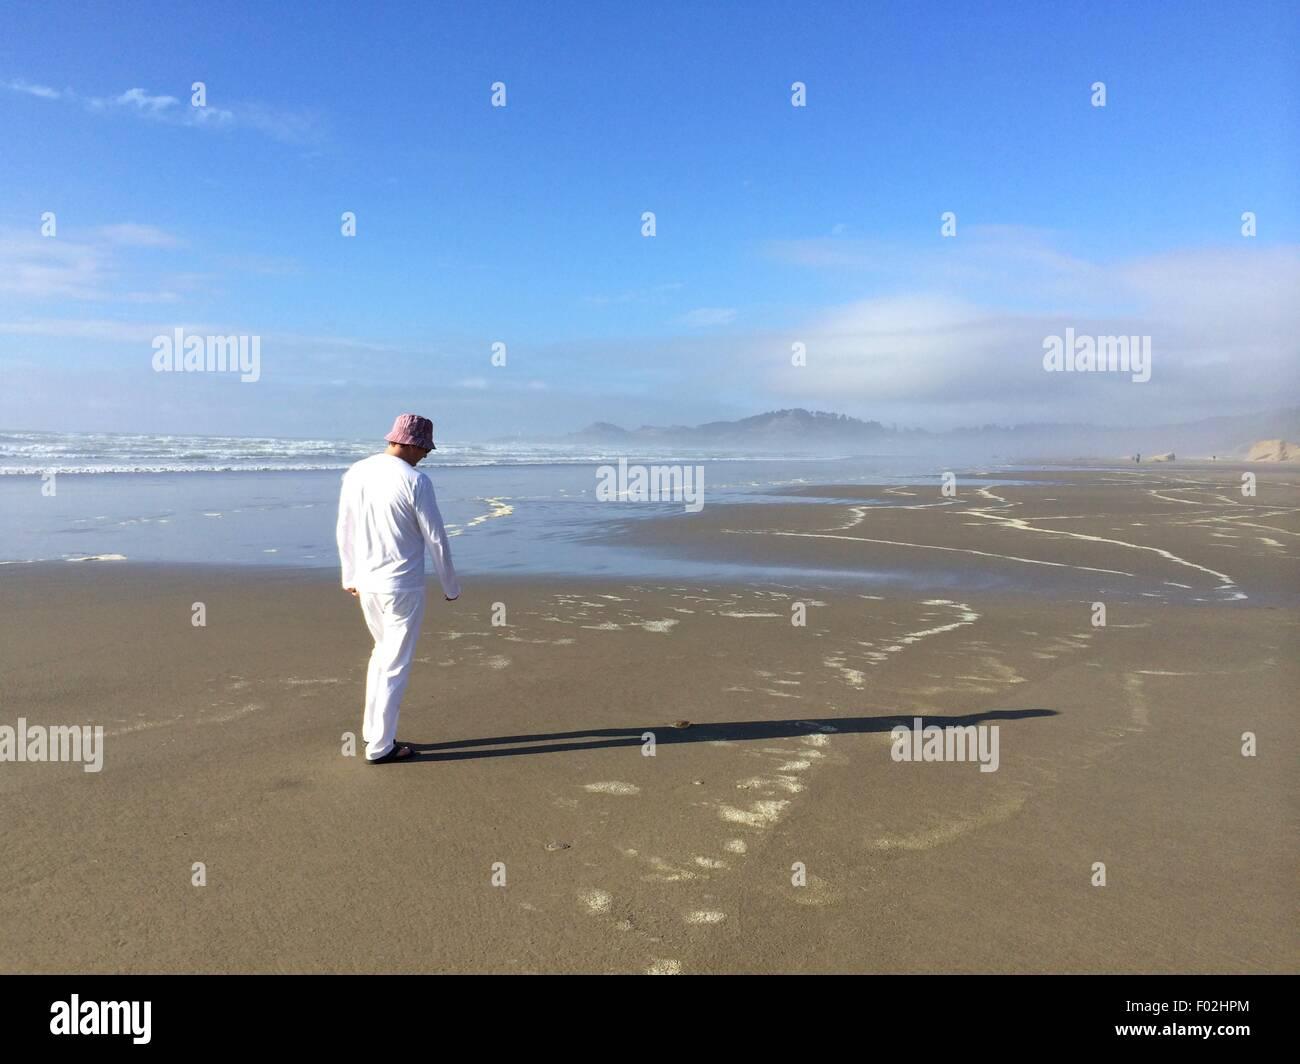 Man walking along the beach, Cannon Beach, Oregon - Stock Image